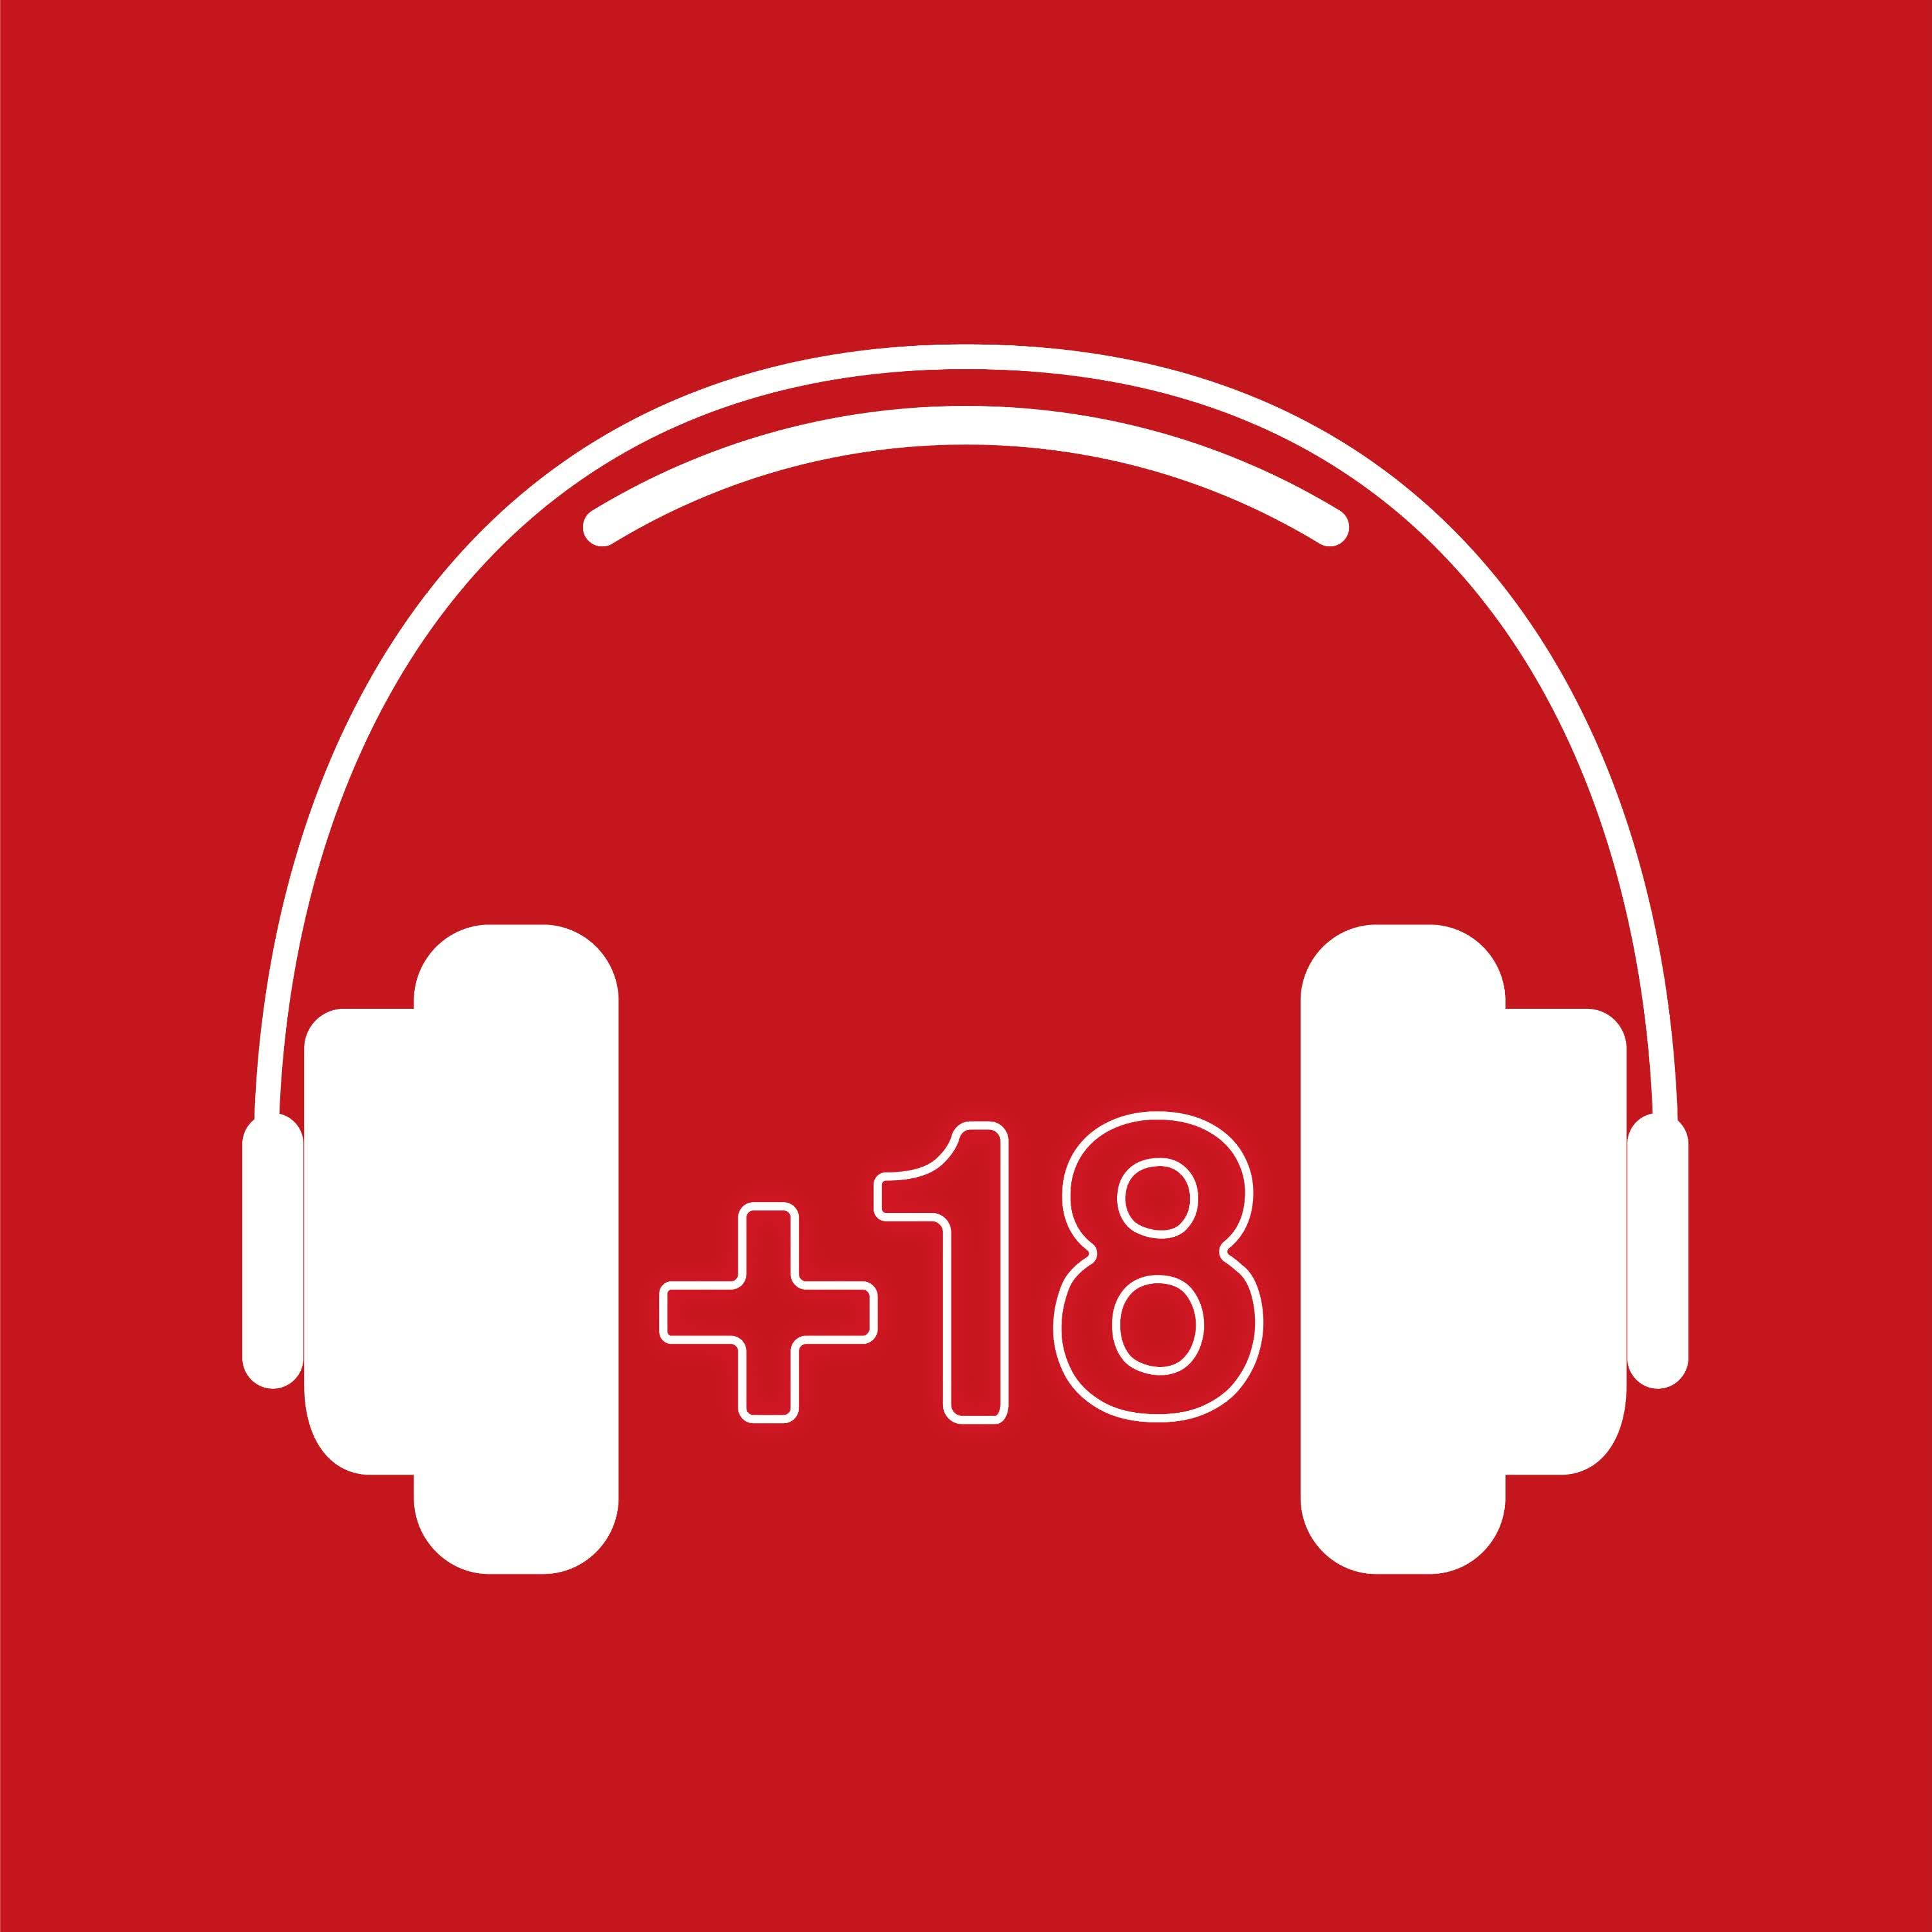 Podcast +18 -مثبت هیژده